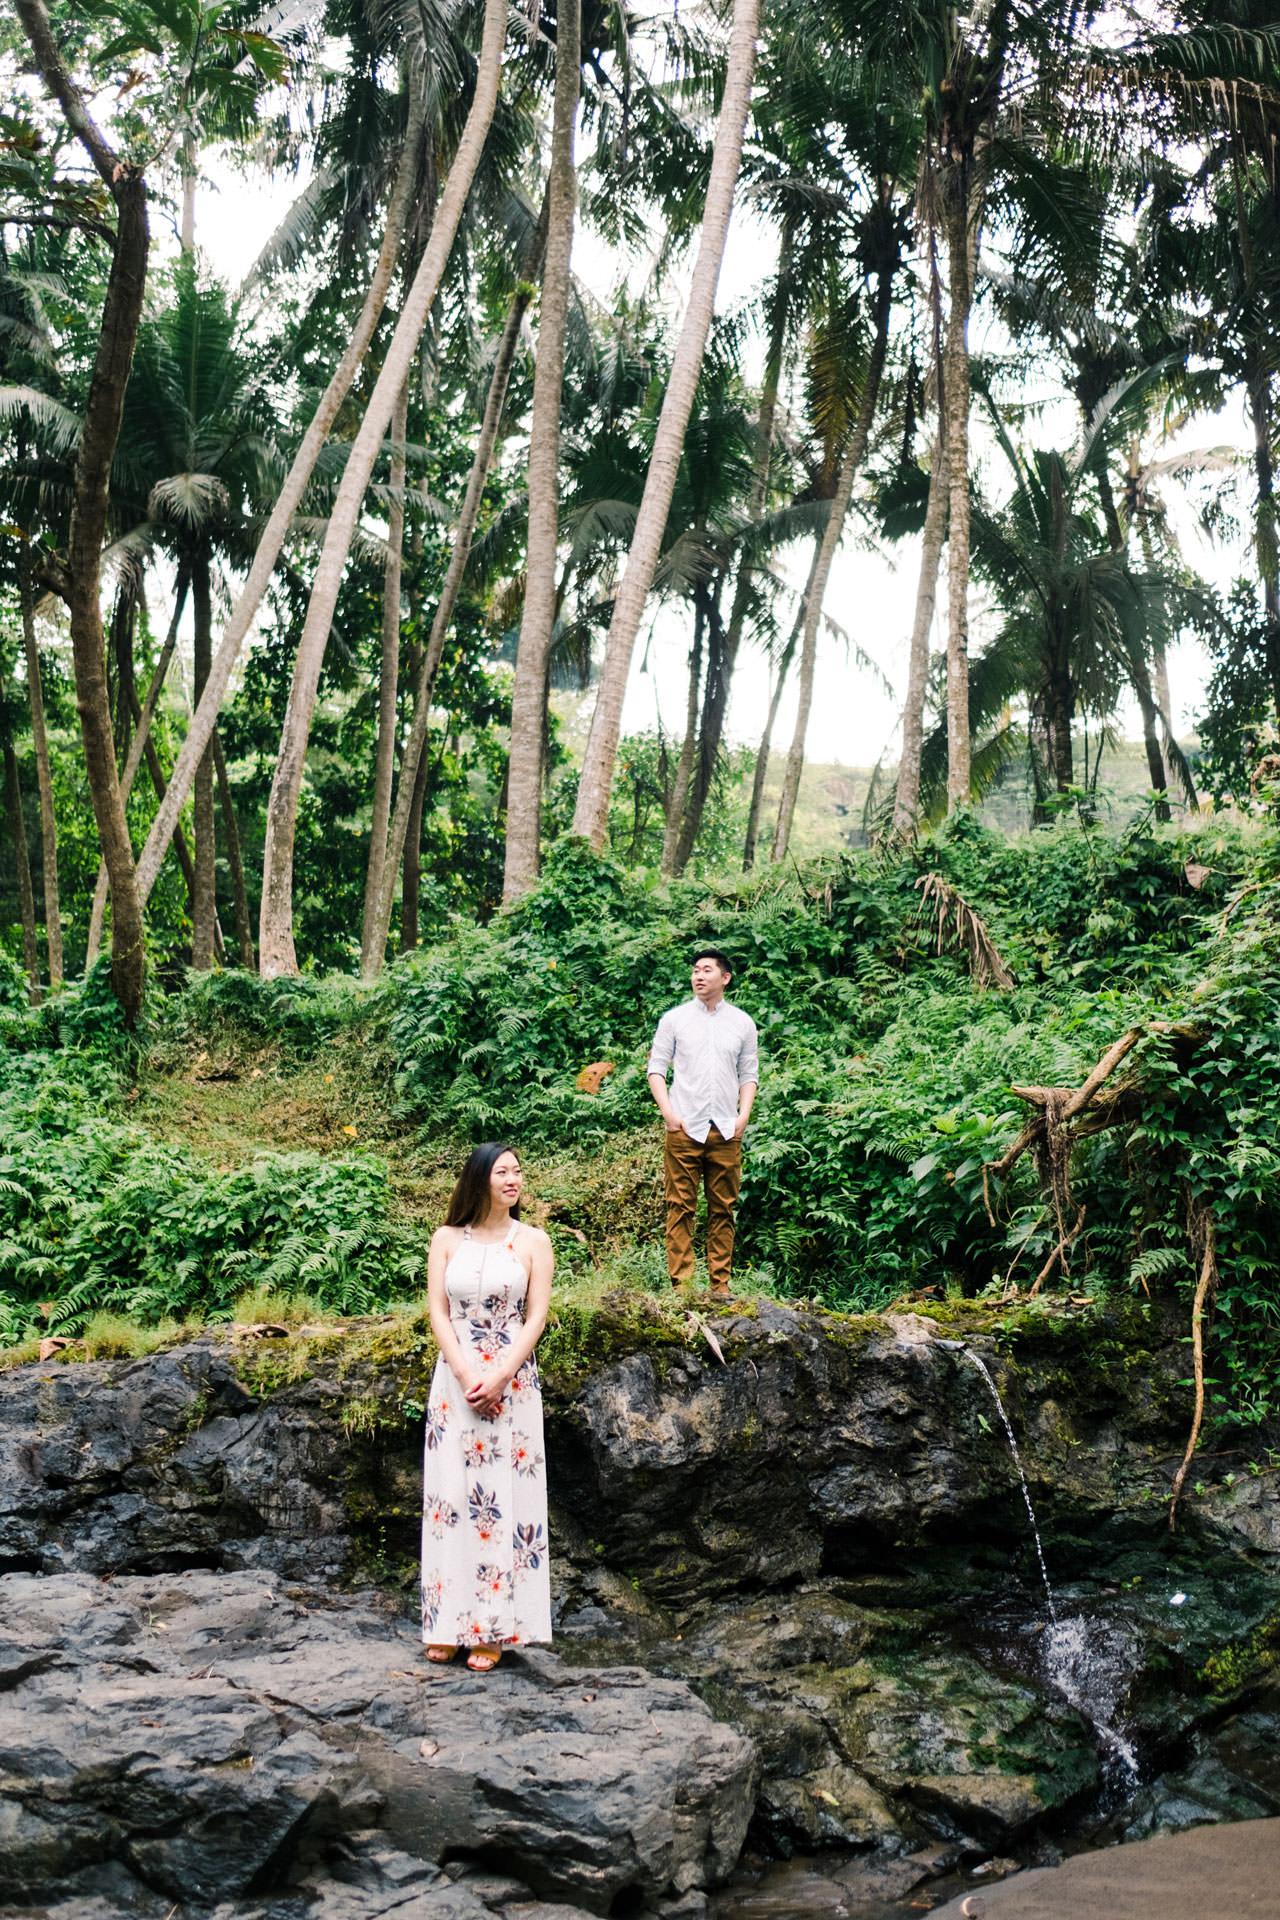 Adventurous Waterfall Surprise Proposal - Bali Vacation Proposal Ideas 3